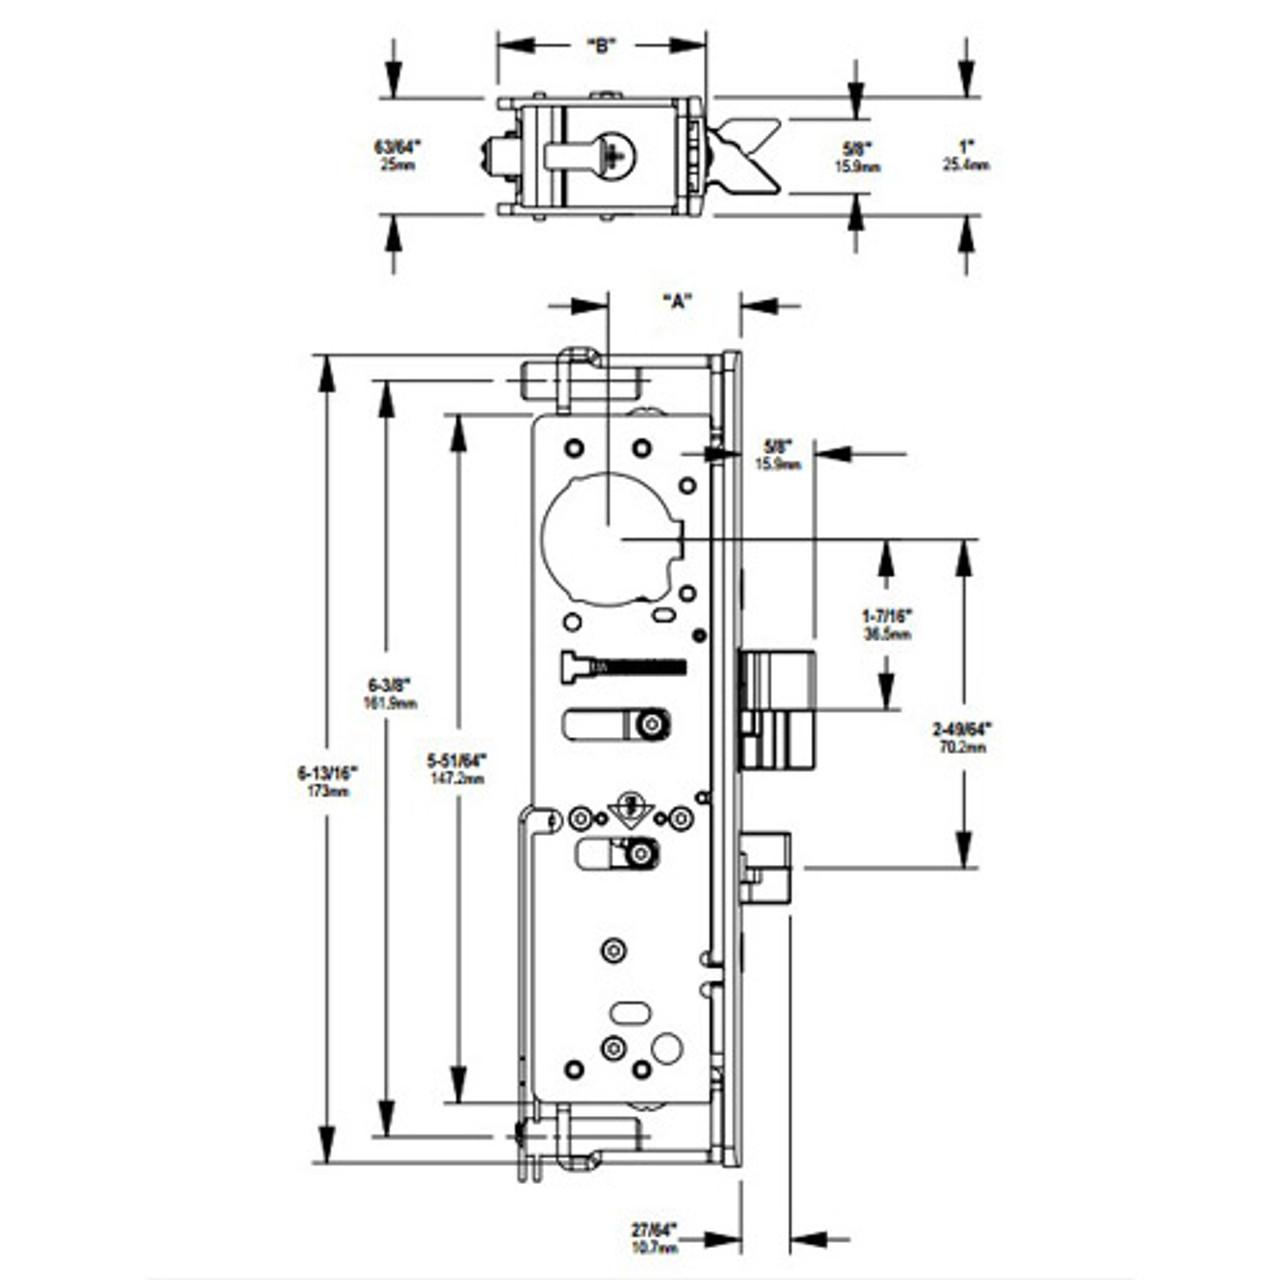 4300-30-217-335 Adams Rite Electrified Deadlatch Dimensional View